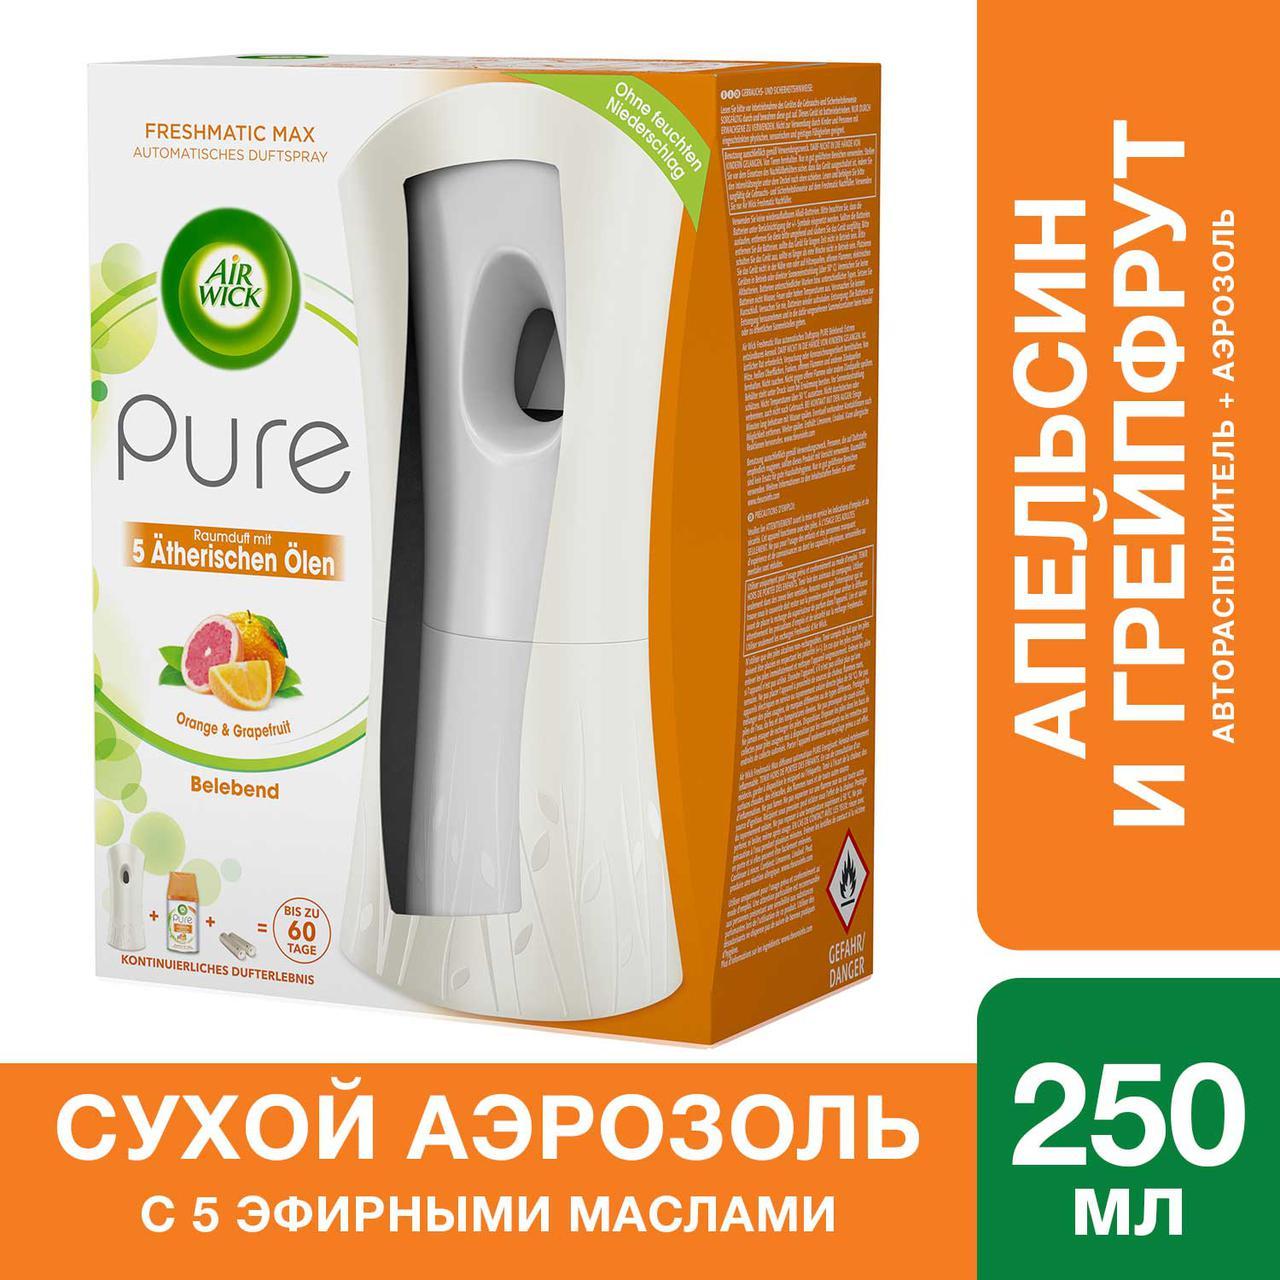 Air Wick Freshmatic з ароматом Апельсина і Грейпфрута Серія Pure 250мл.